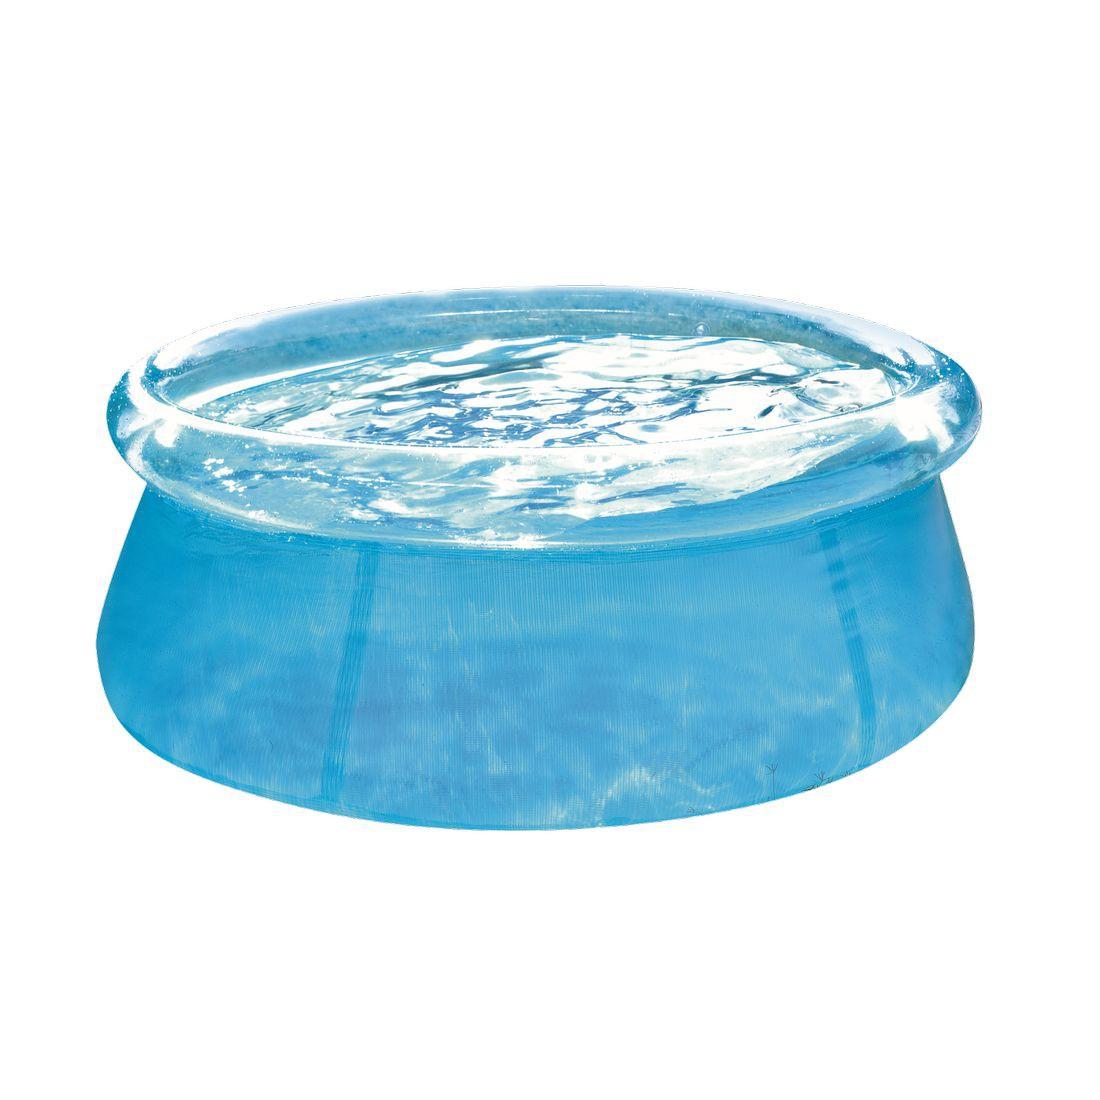 Pools For Kids buy jilong see-thru kids pool 183 - transparent quick-up children